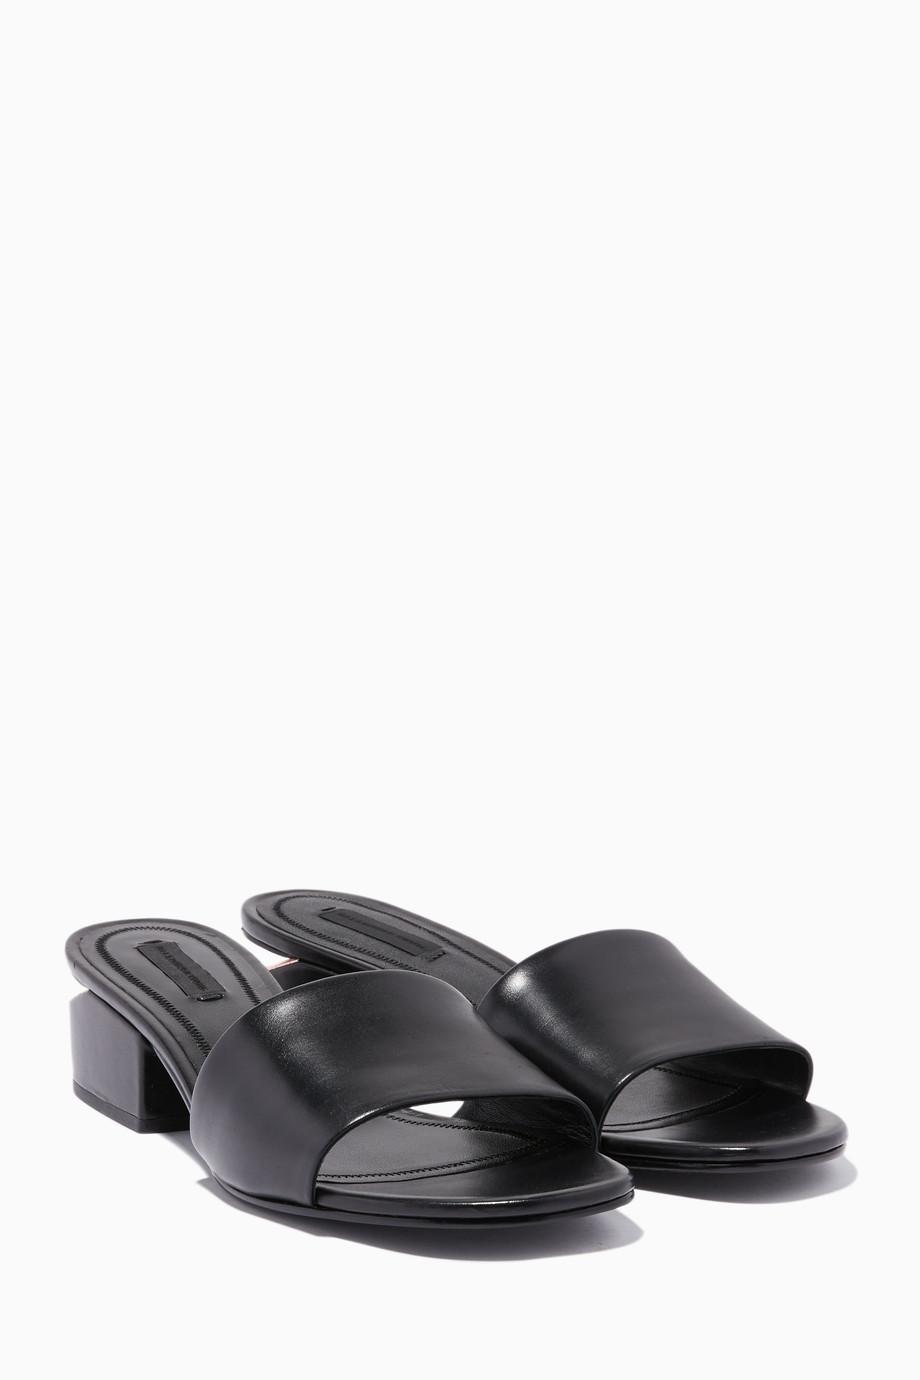 76450951f Shop Alexander Wang Black Black Lou Sandals for Women